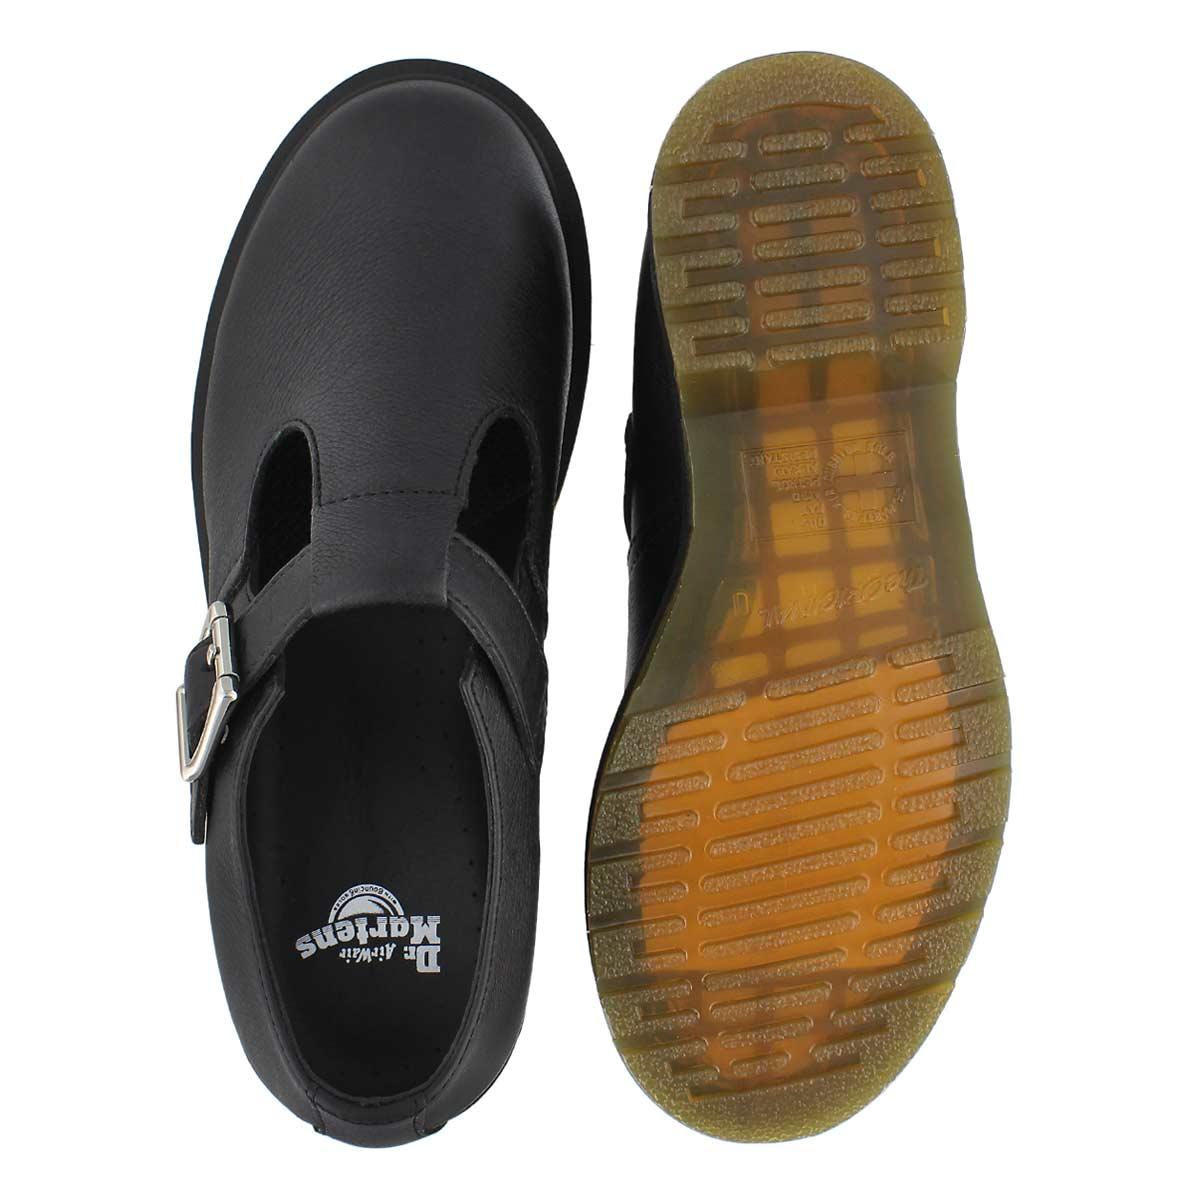 Lds Polley Plain Welt black slip on shoe